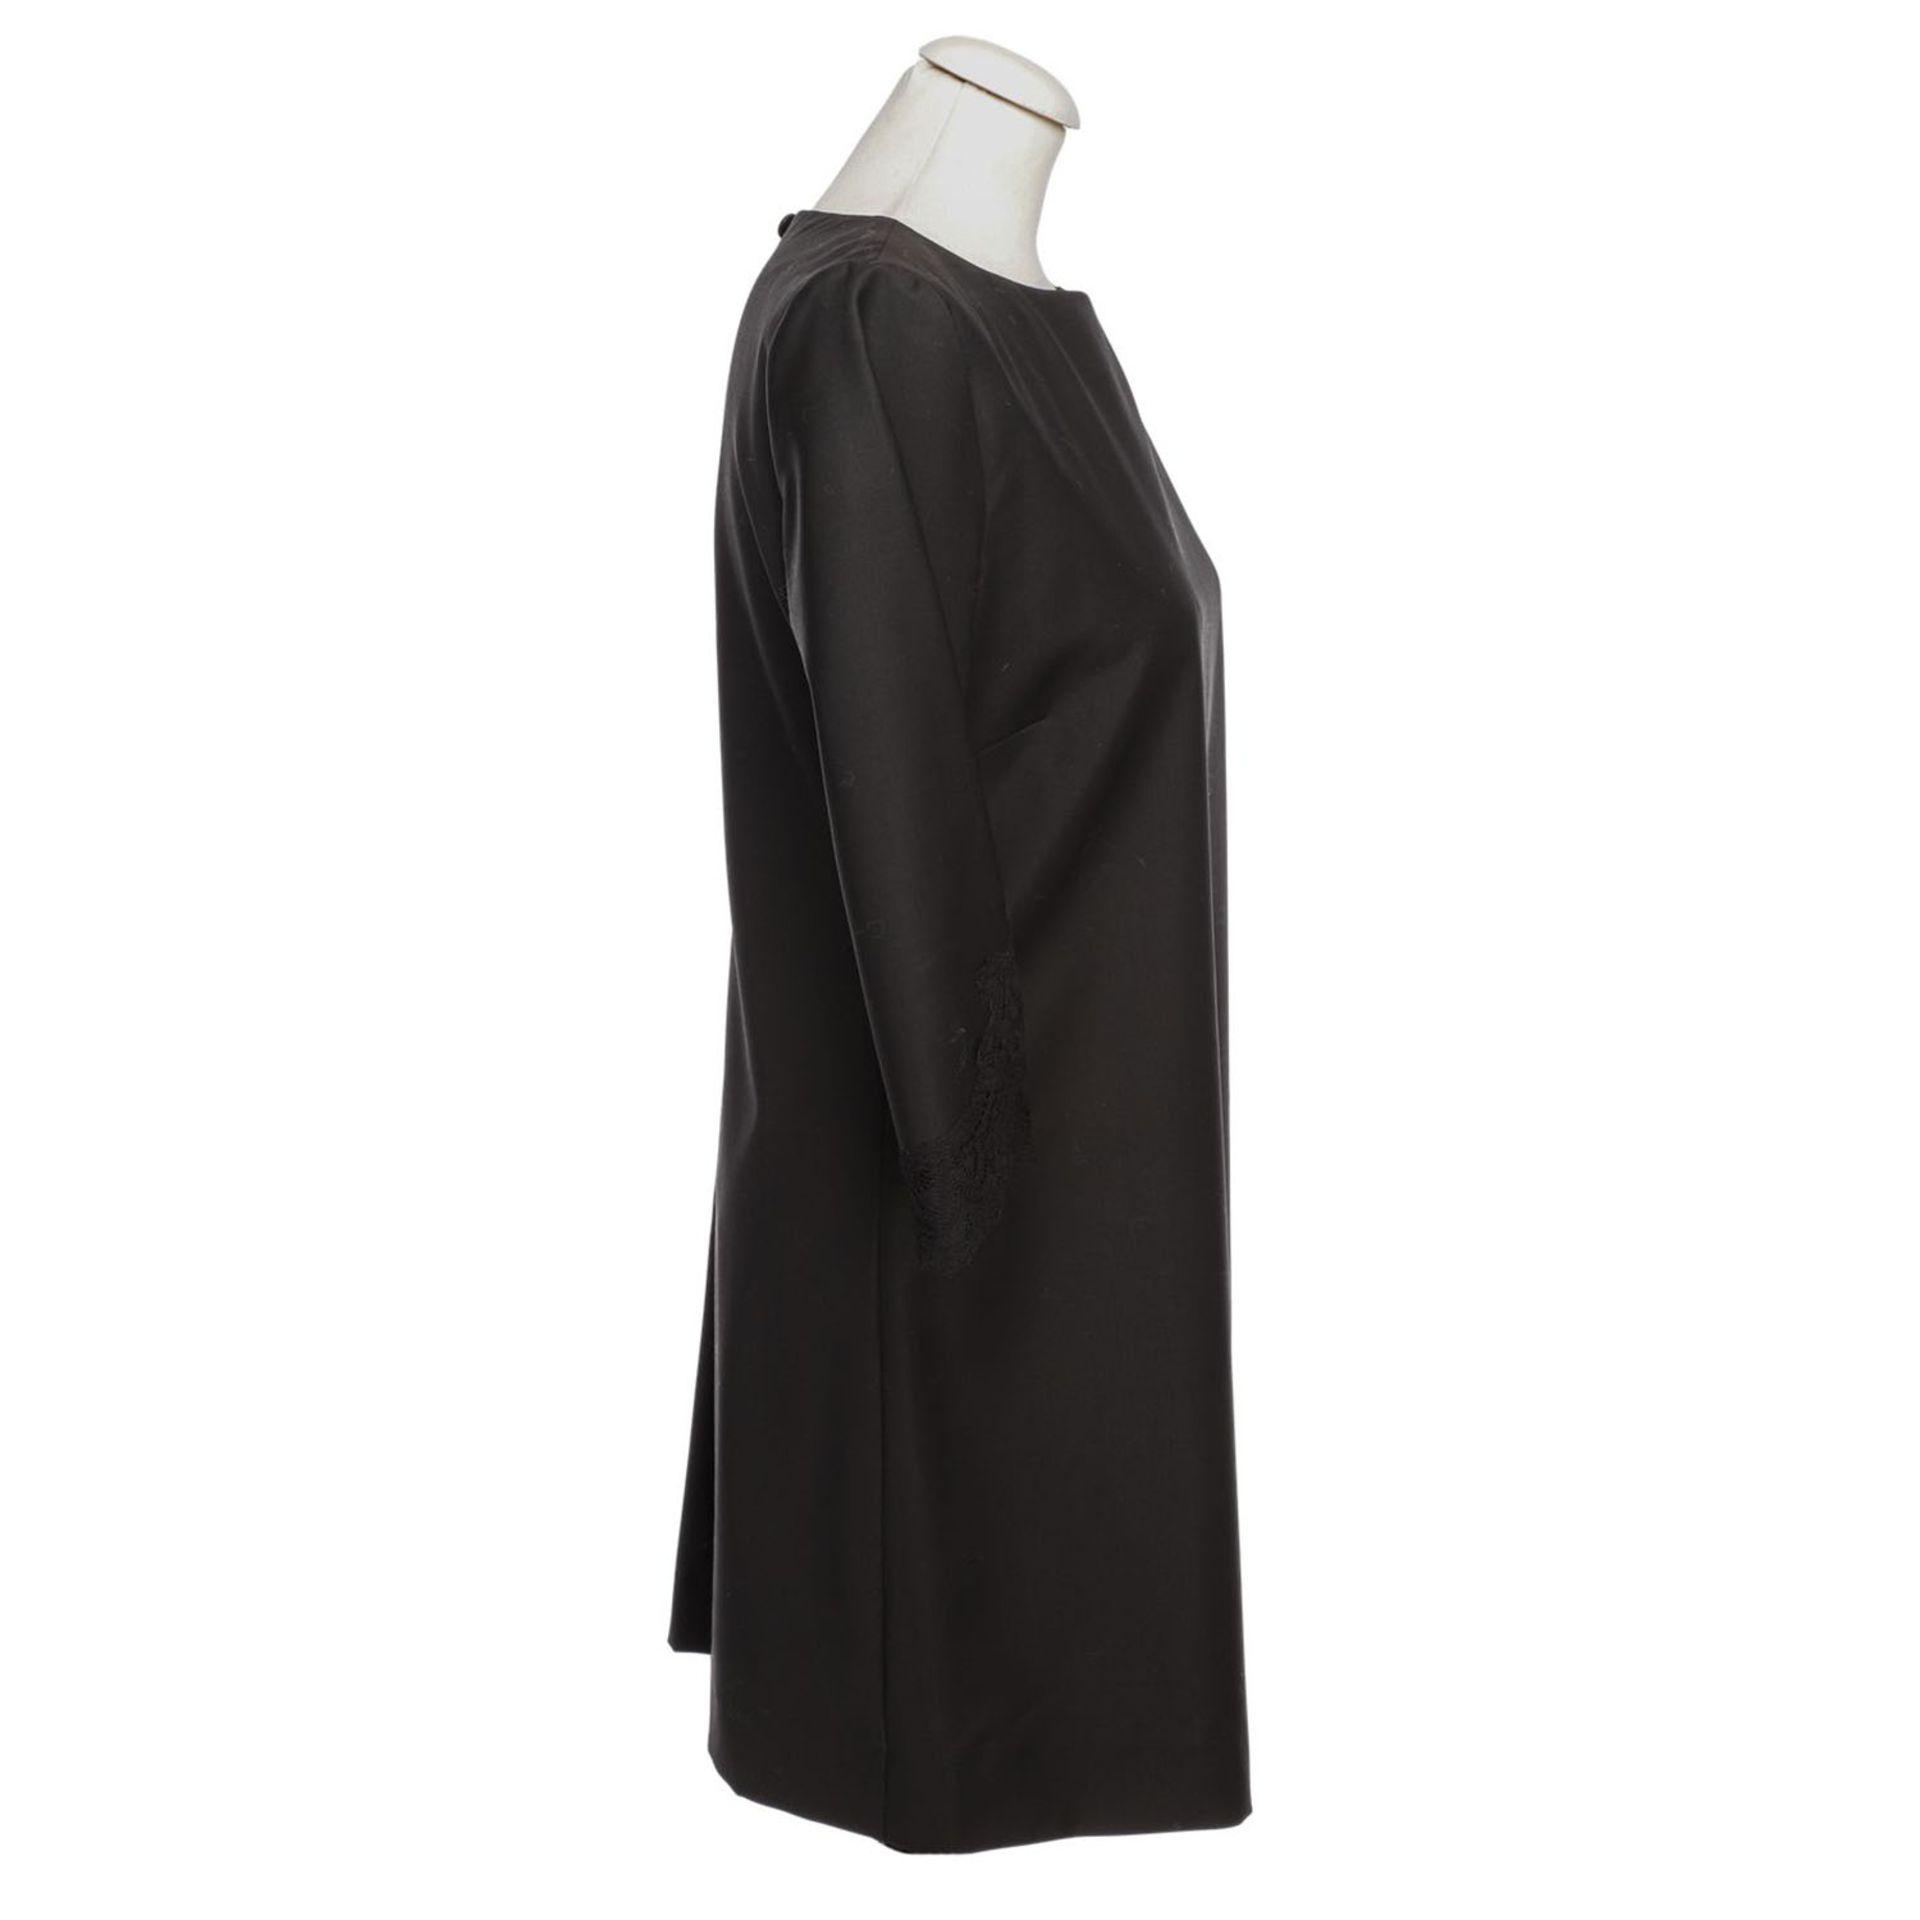 PATRIZIA PEPE Kleid, Gr. 38 (ital. 44). - Bild 3 aus 4